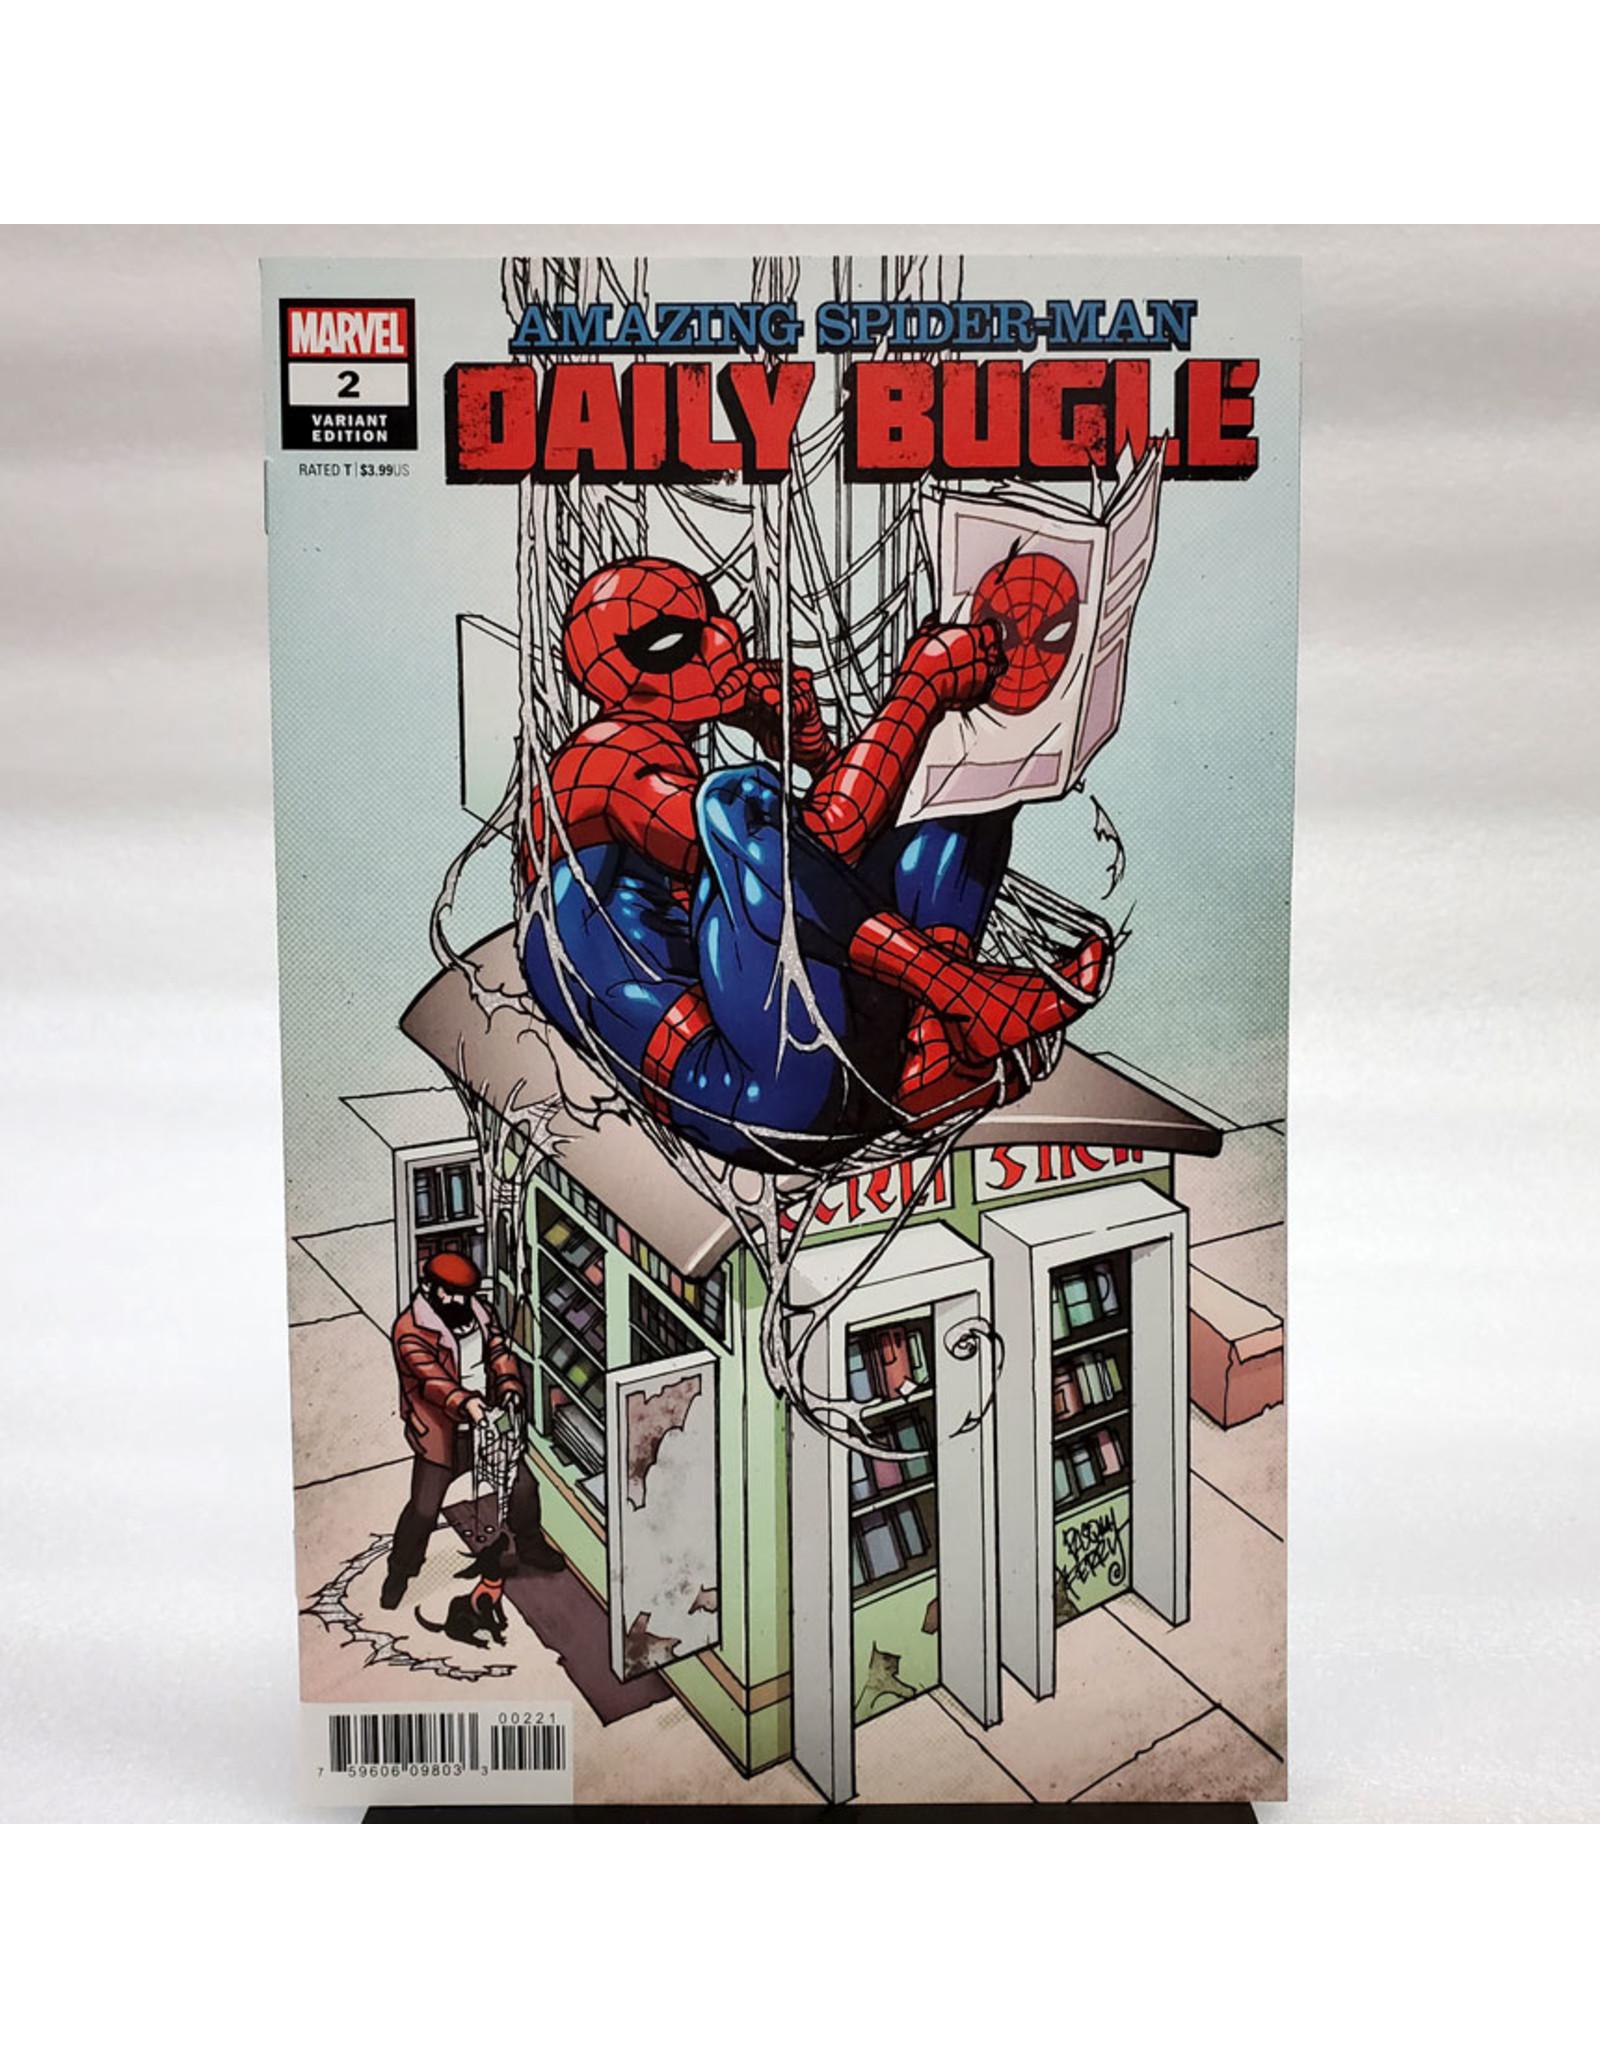 MARVEL COMICS AMAZING SPIDER-MAN DAILY BUGLE #2 (OF 5) 1:25 FERRY VAR